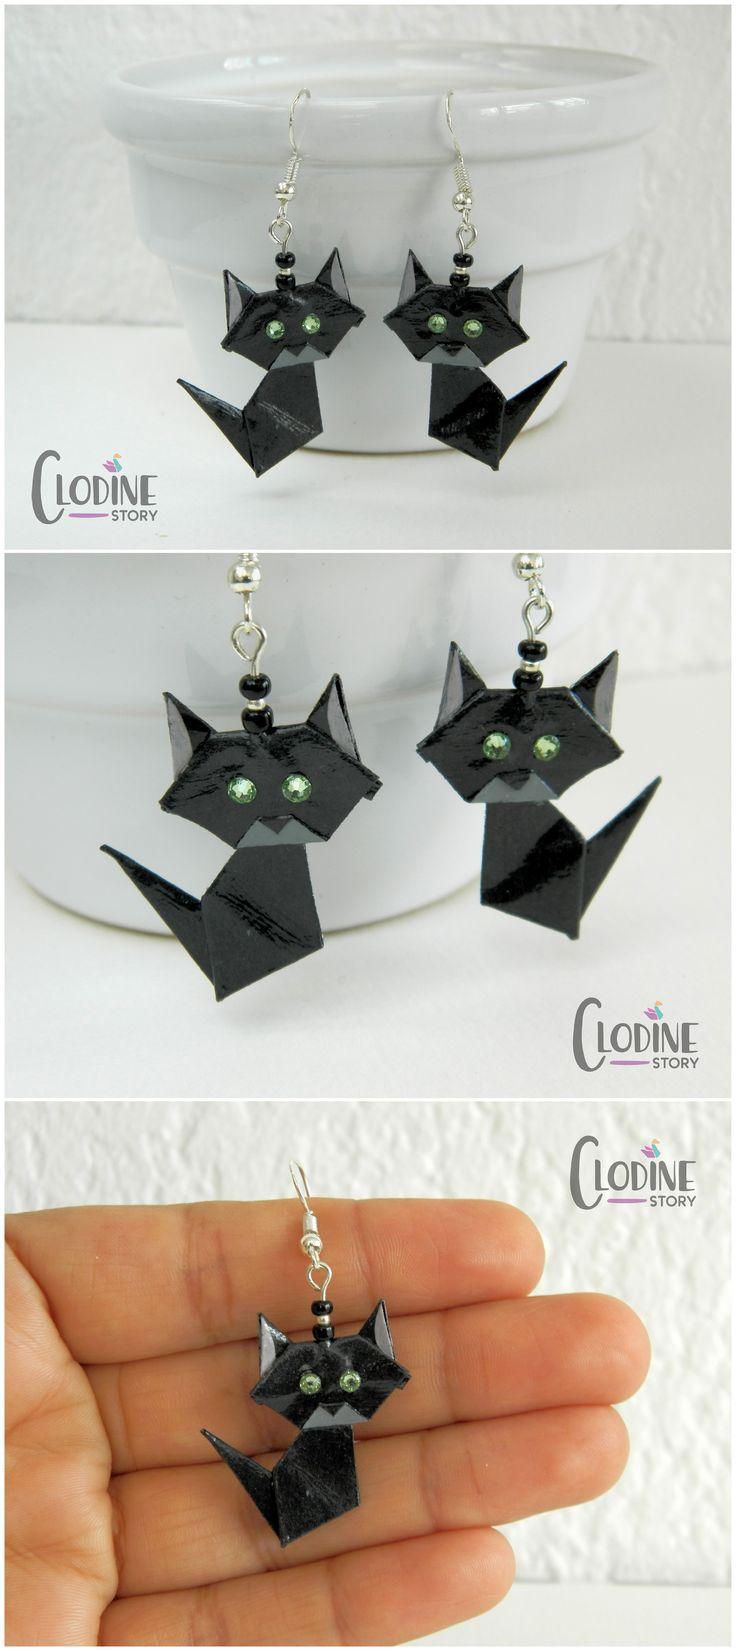 The 25 best origami eye ideas on pinterest geometric origami black cat origami earrings black origami cat black cat cat jewelry origami jeuxipadfo Choice Image